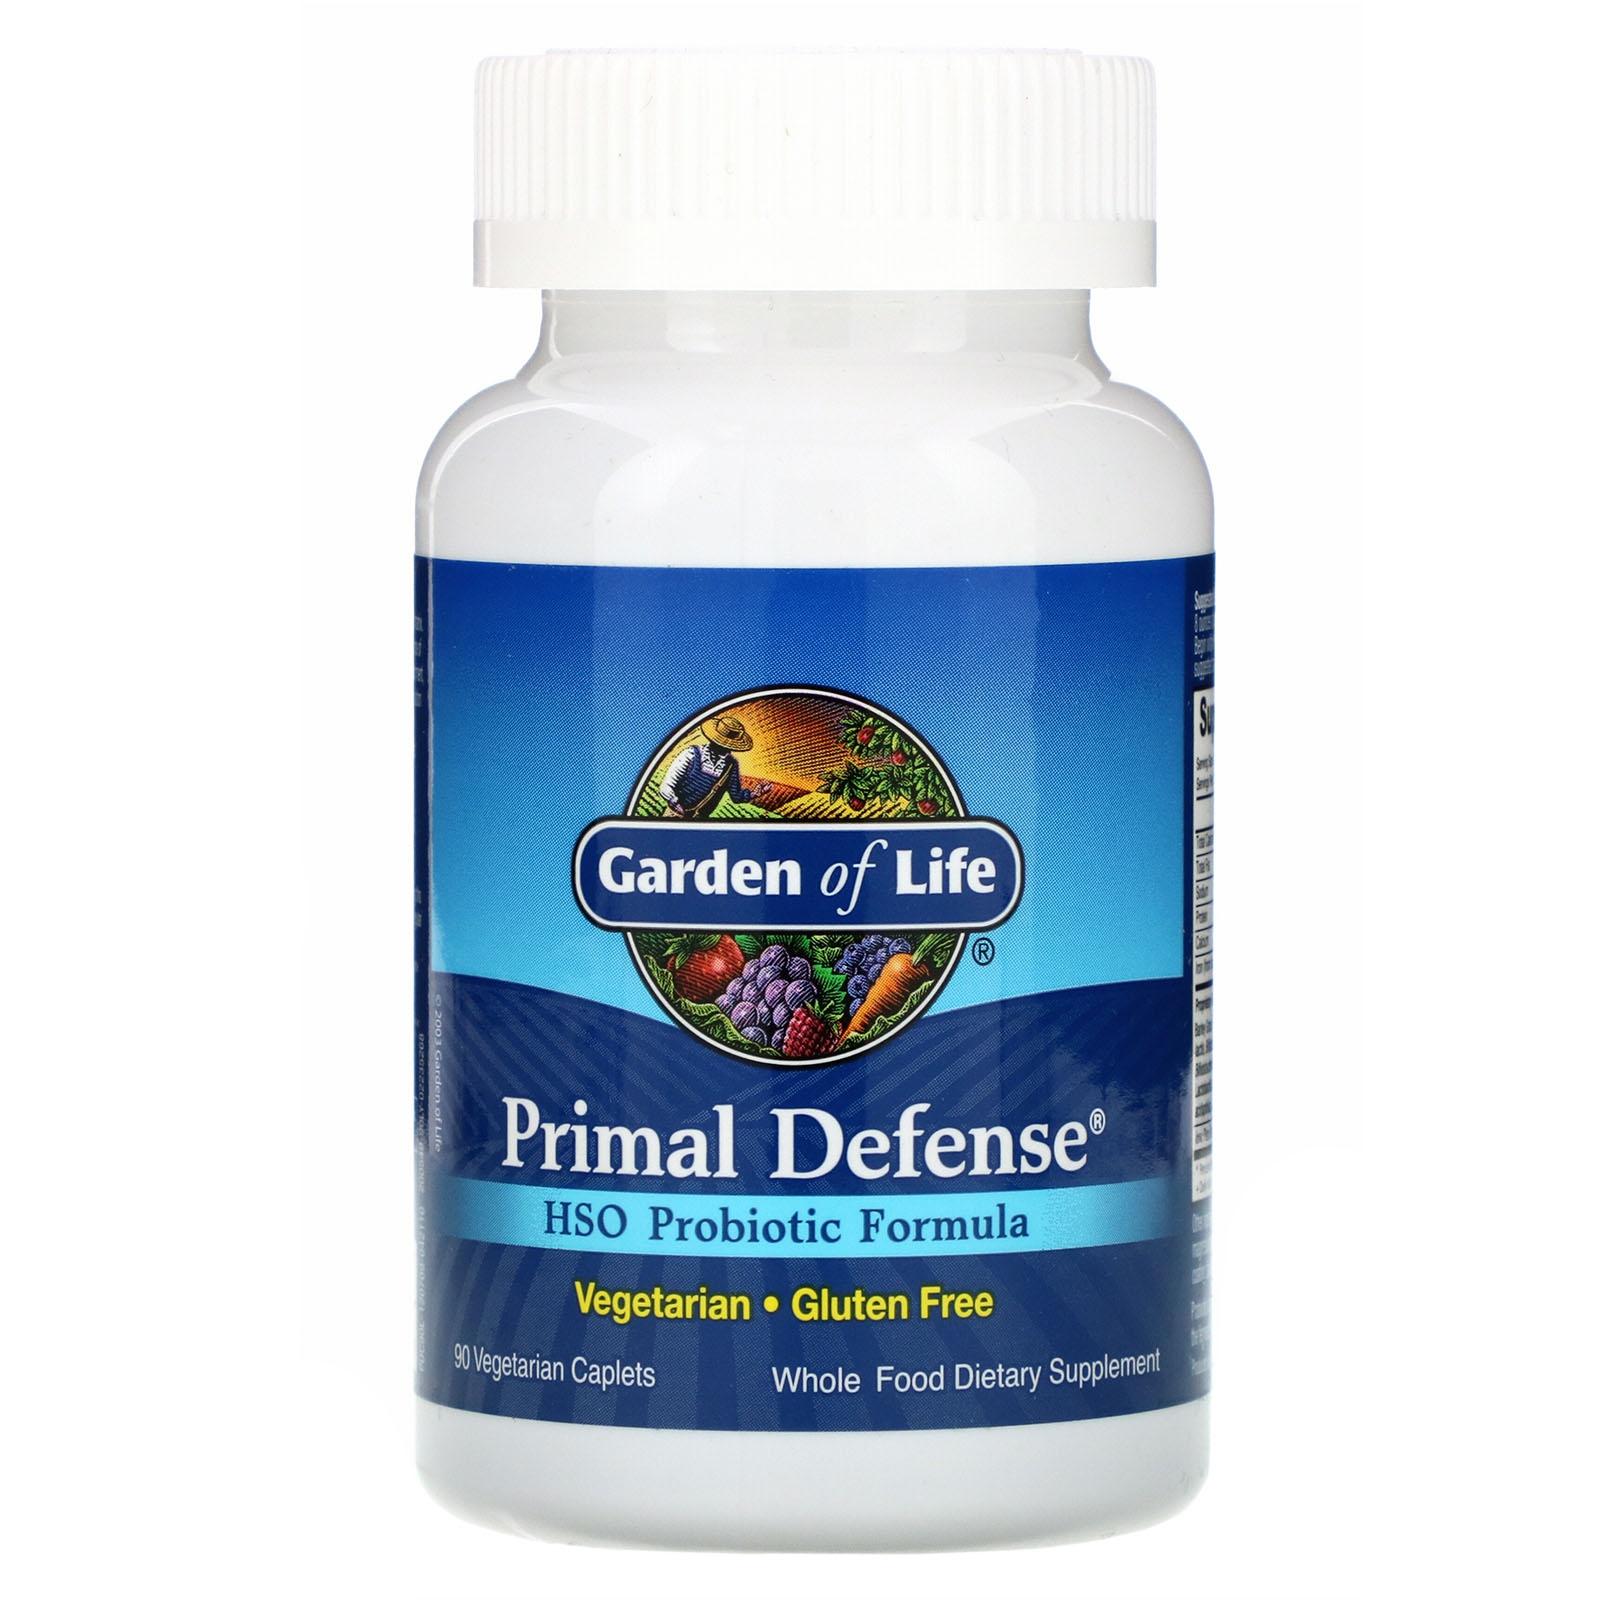 Primal Defense HSO Probiotic Formula (90 caplet) Garden of Life